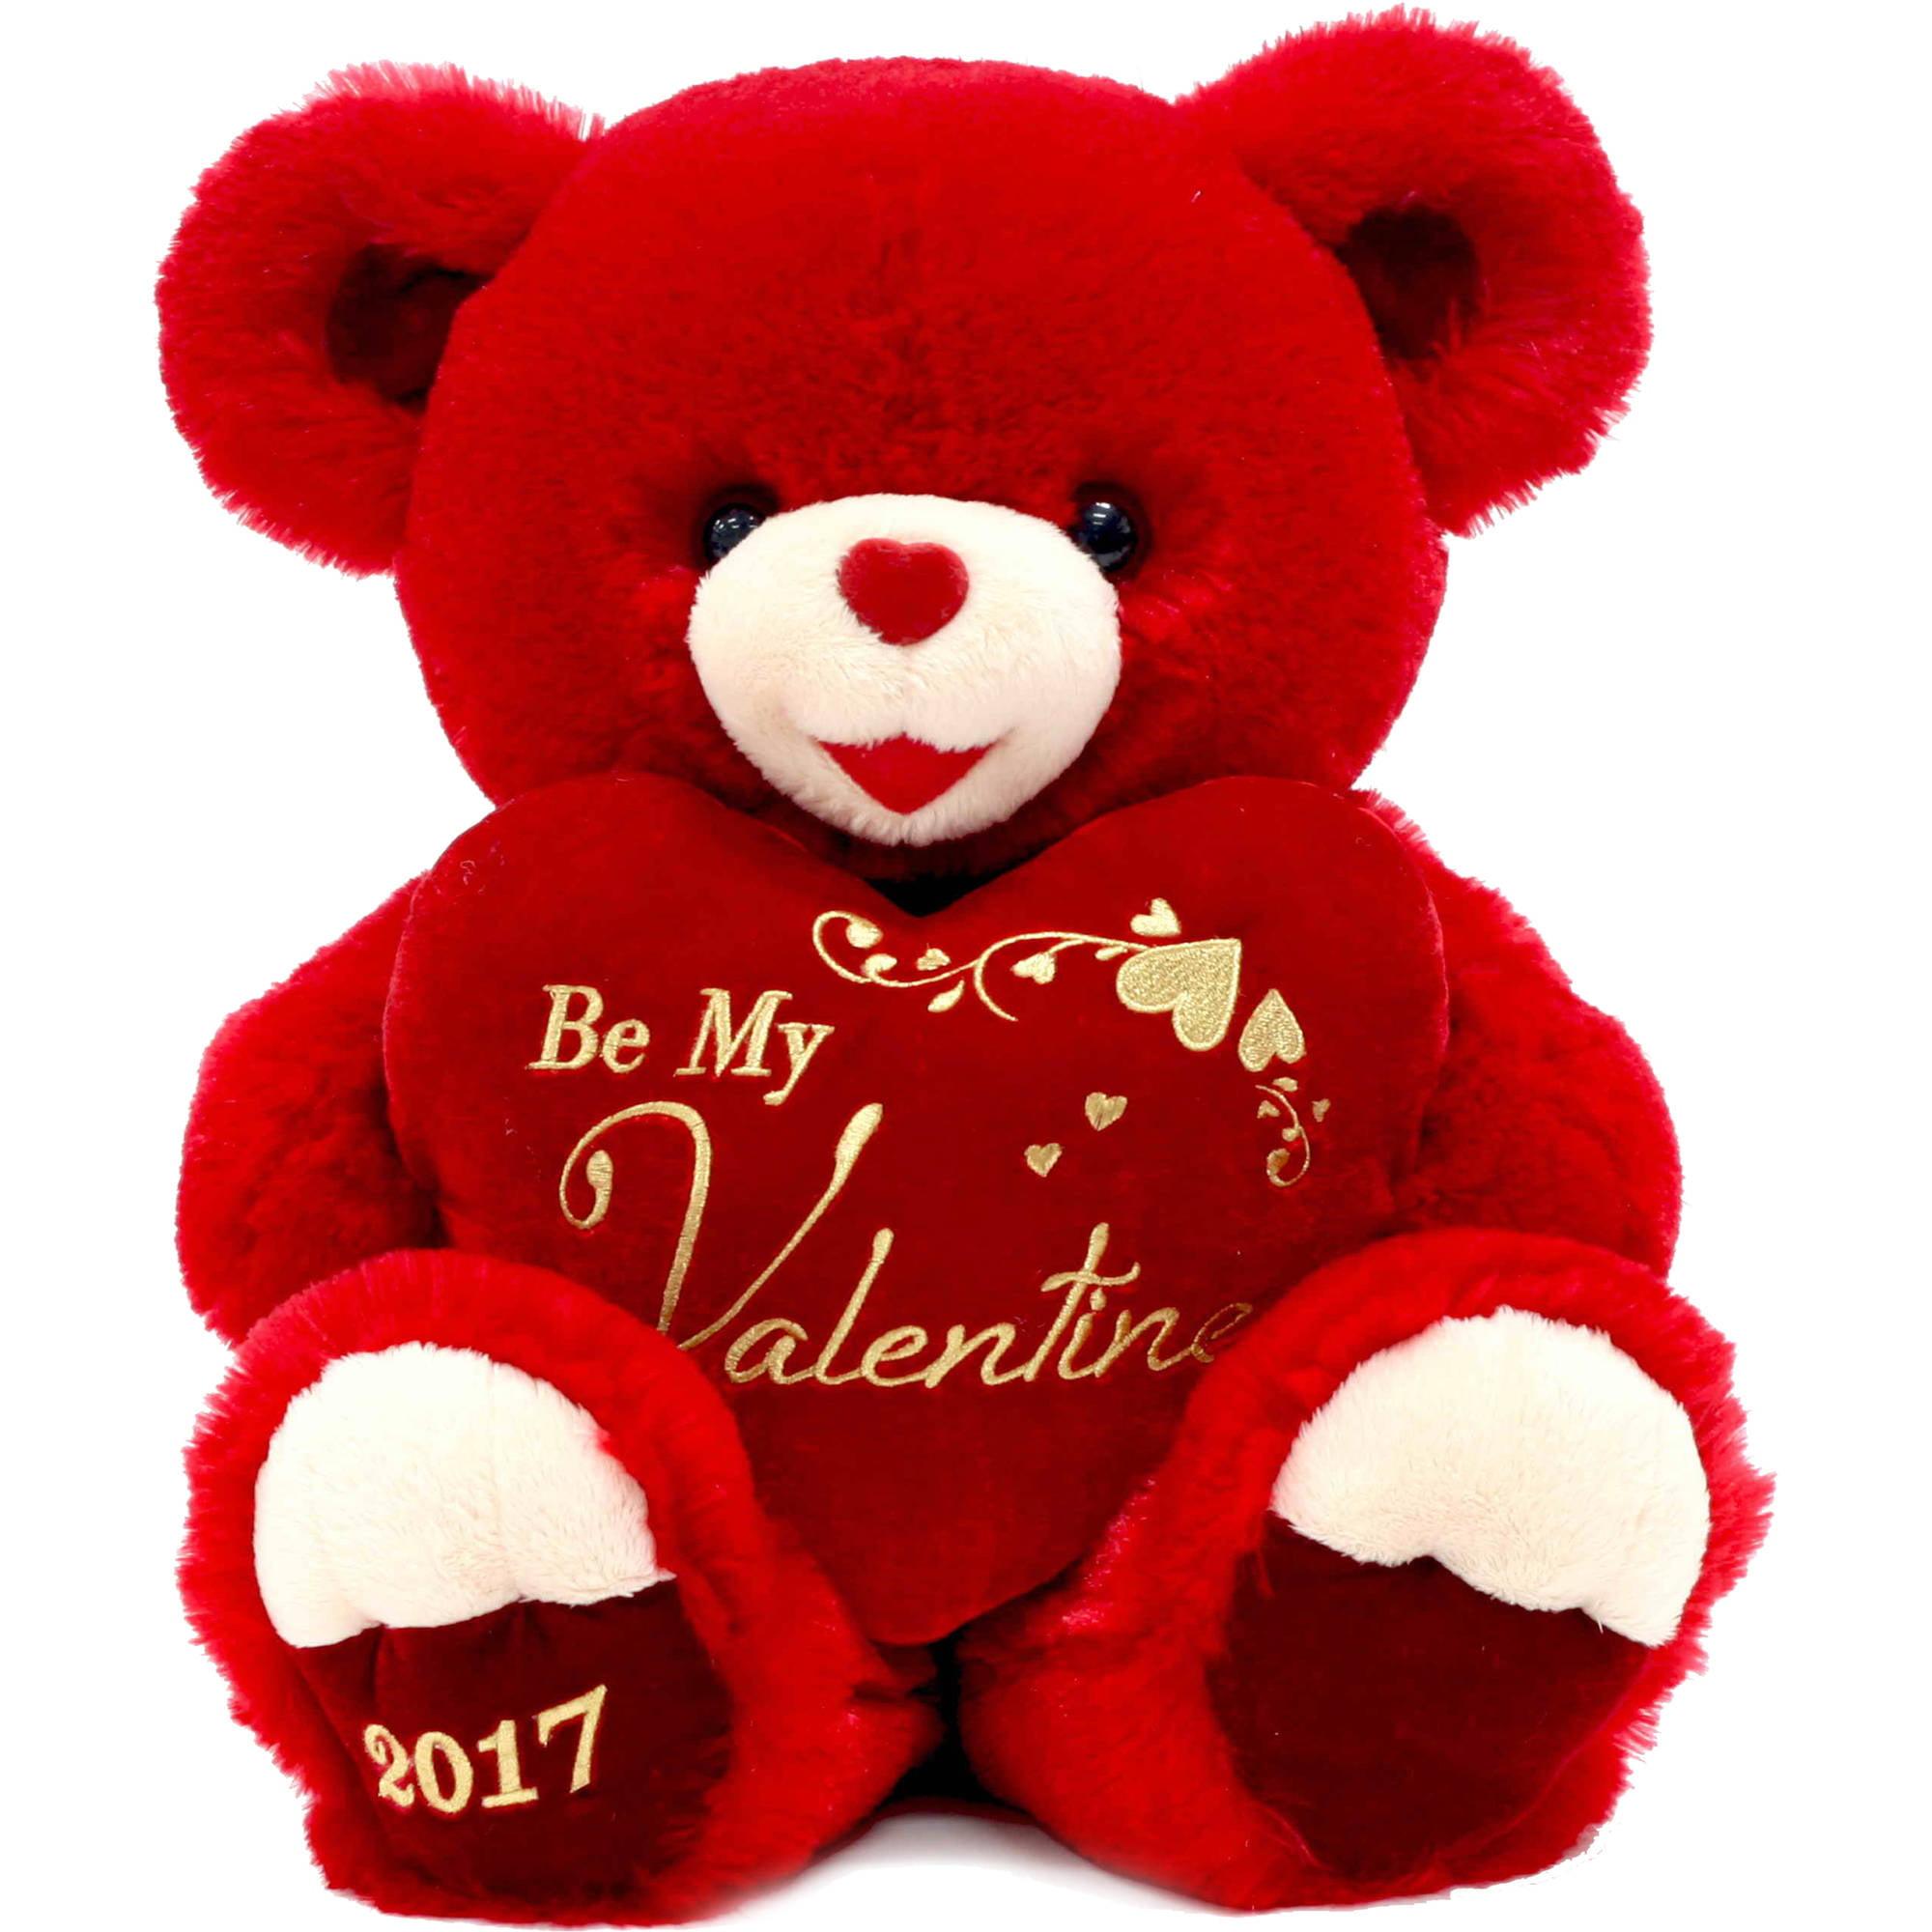 sweetheart teddy bear 14 brown walmartcom - Walmart Valentine Gifts